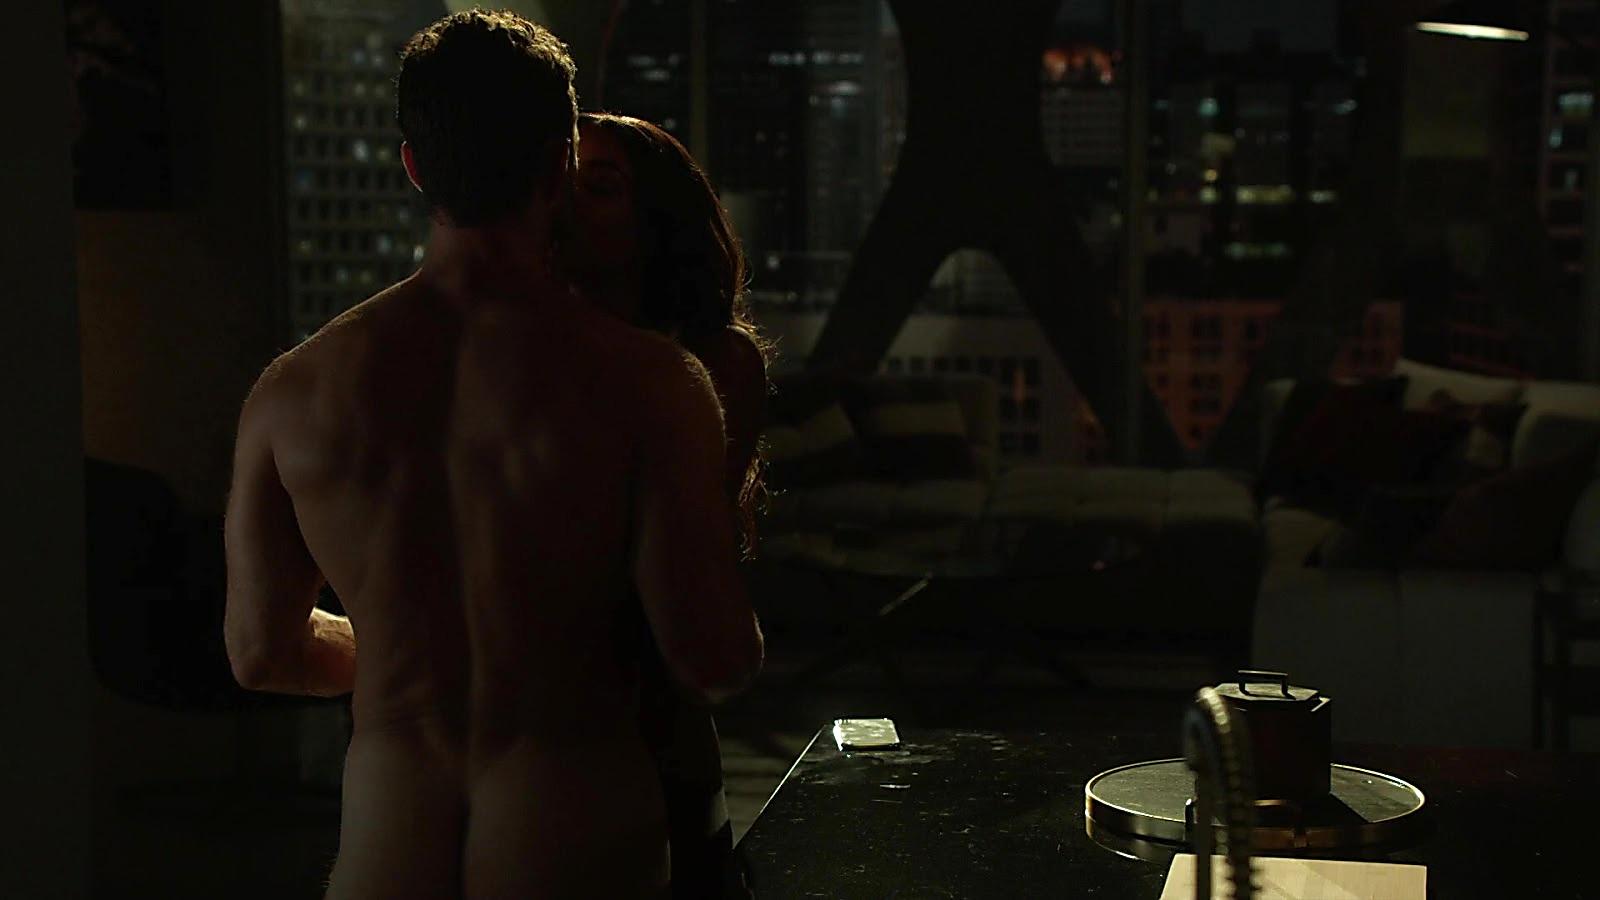 David Fumero sexy shirtless scene July 21, 2020, 12pm